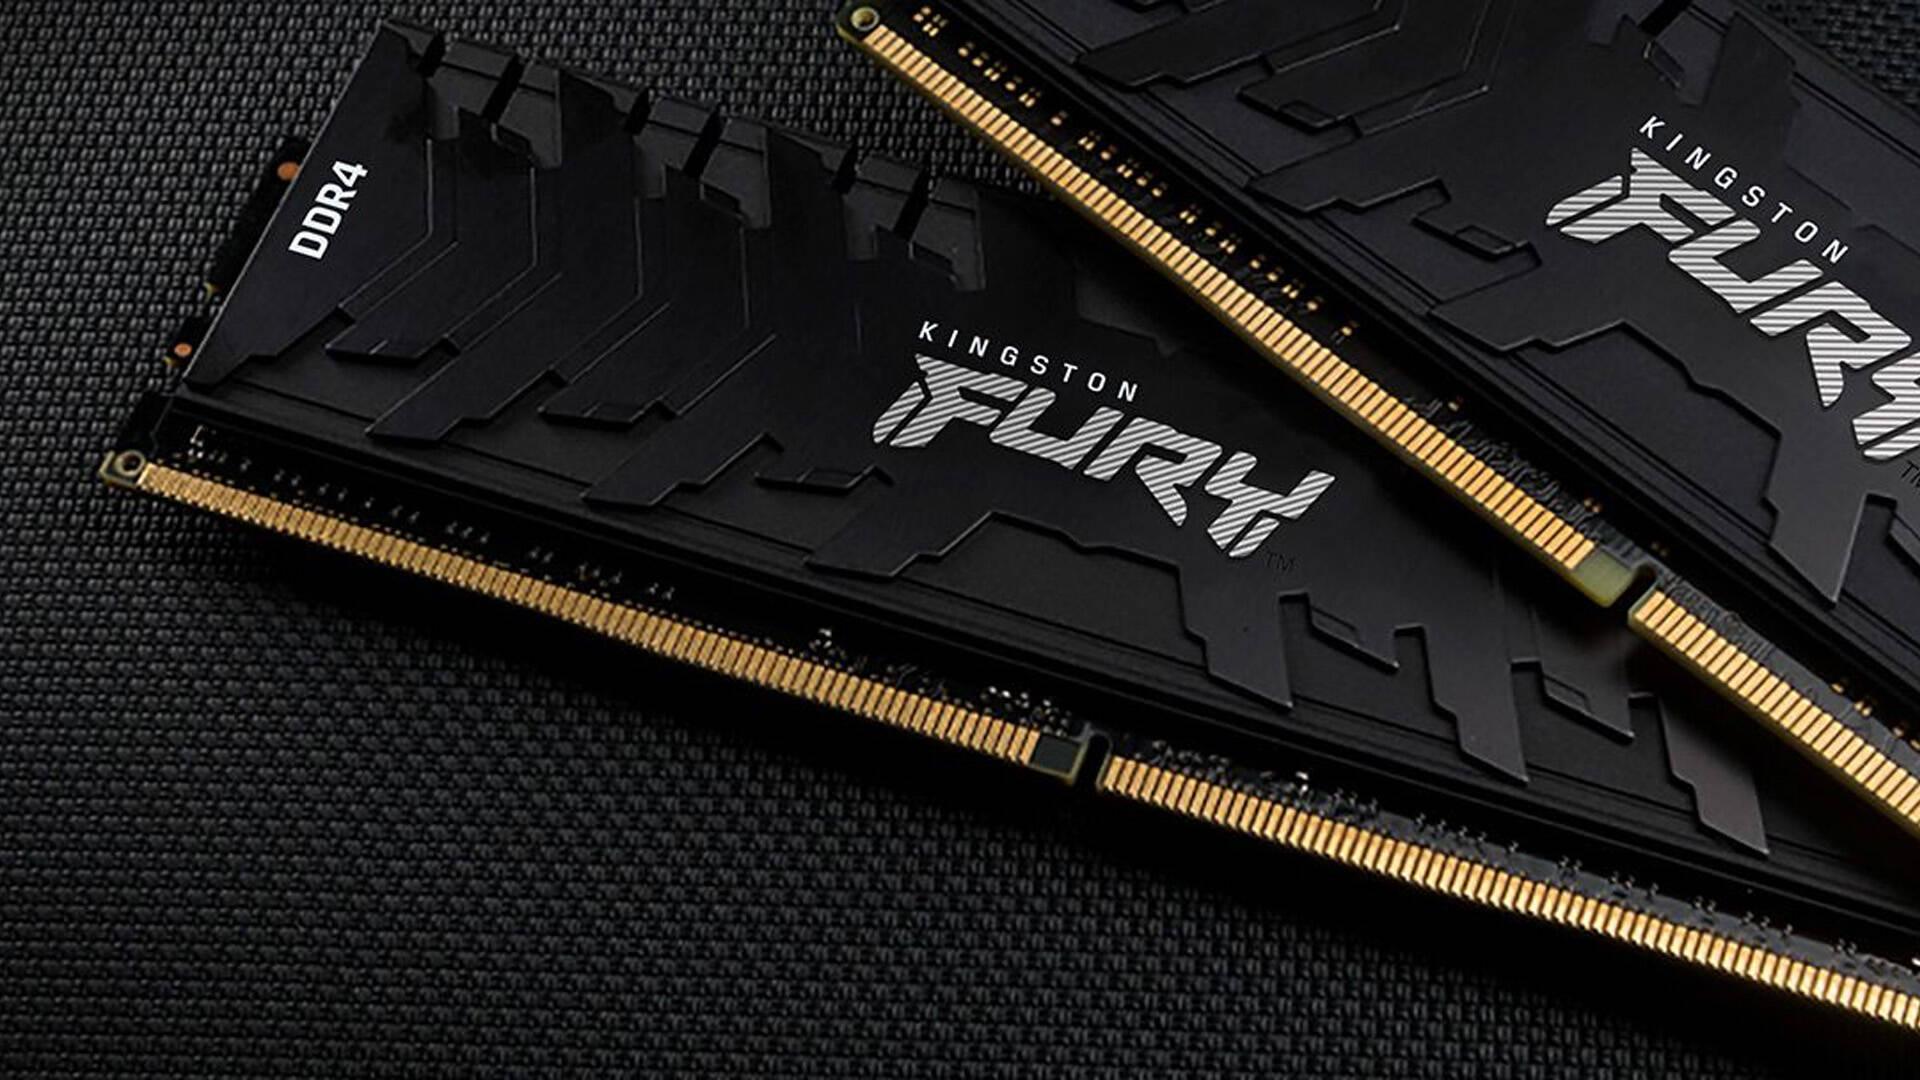 Kingston RAM DDR4 e DDR3